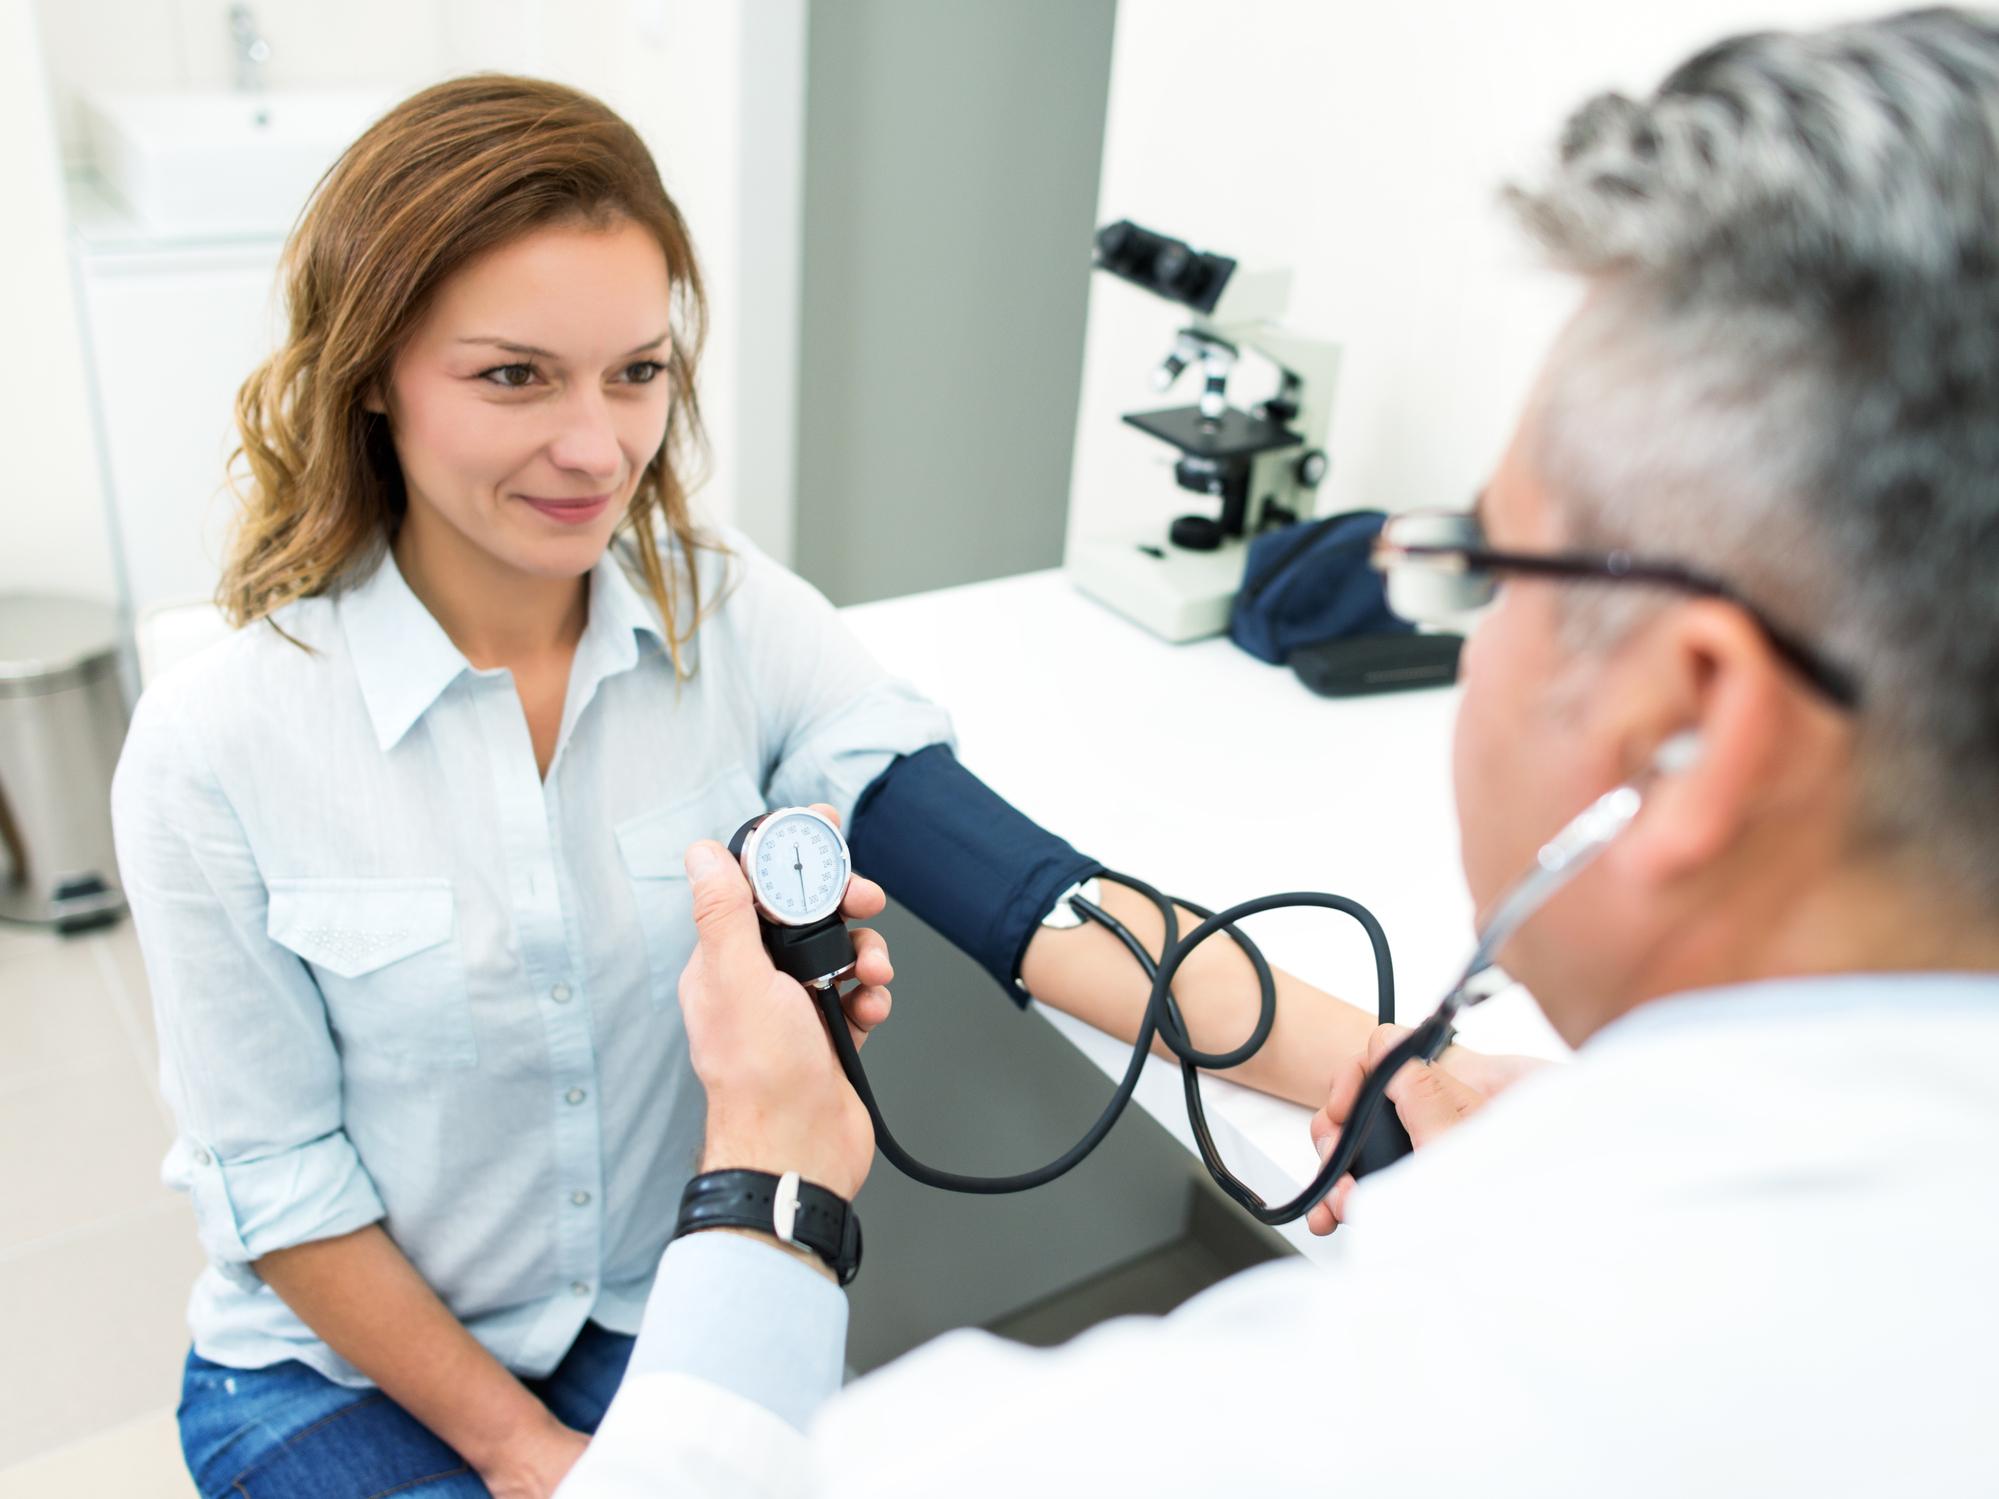 arthra magas vérnyomás esetén milyen terhelések lehetnek magas vérnyomás esetén